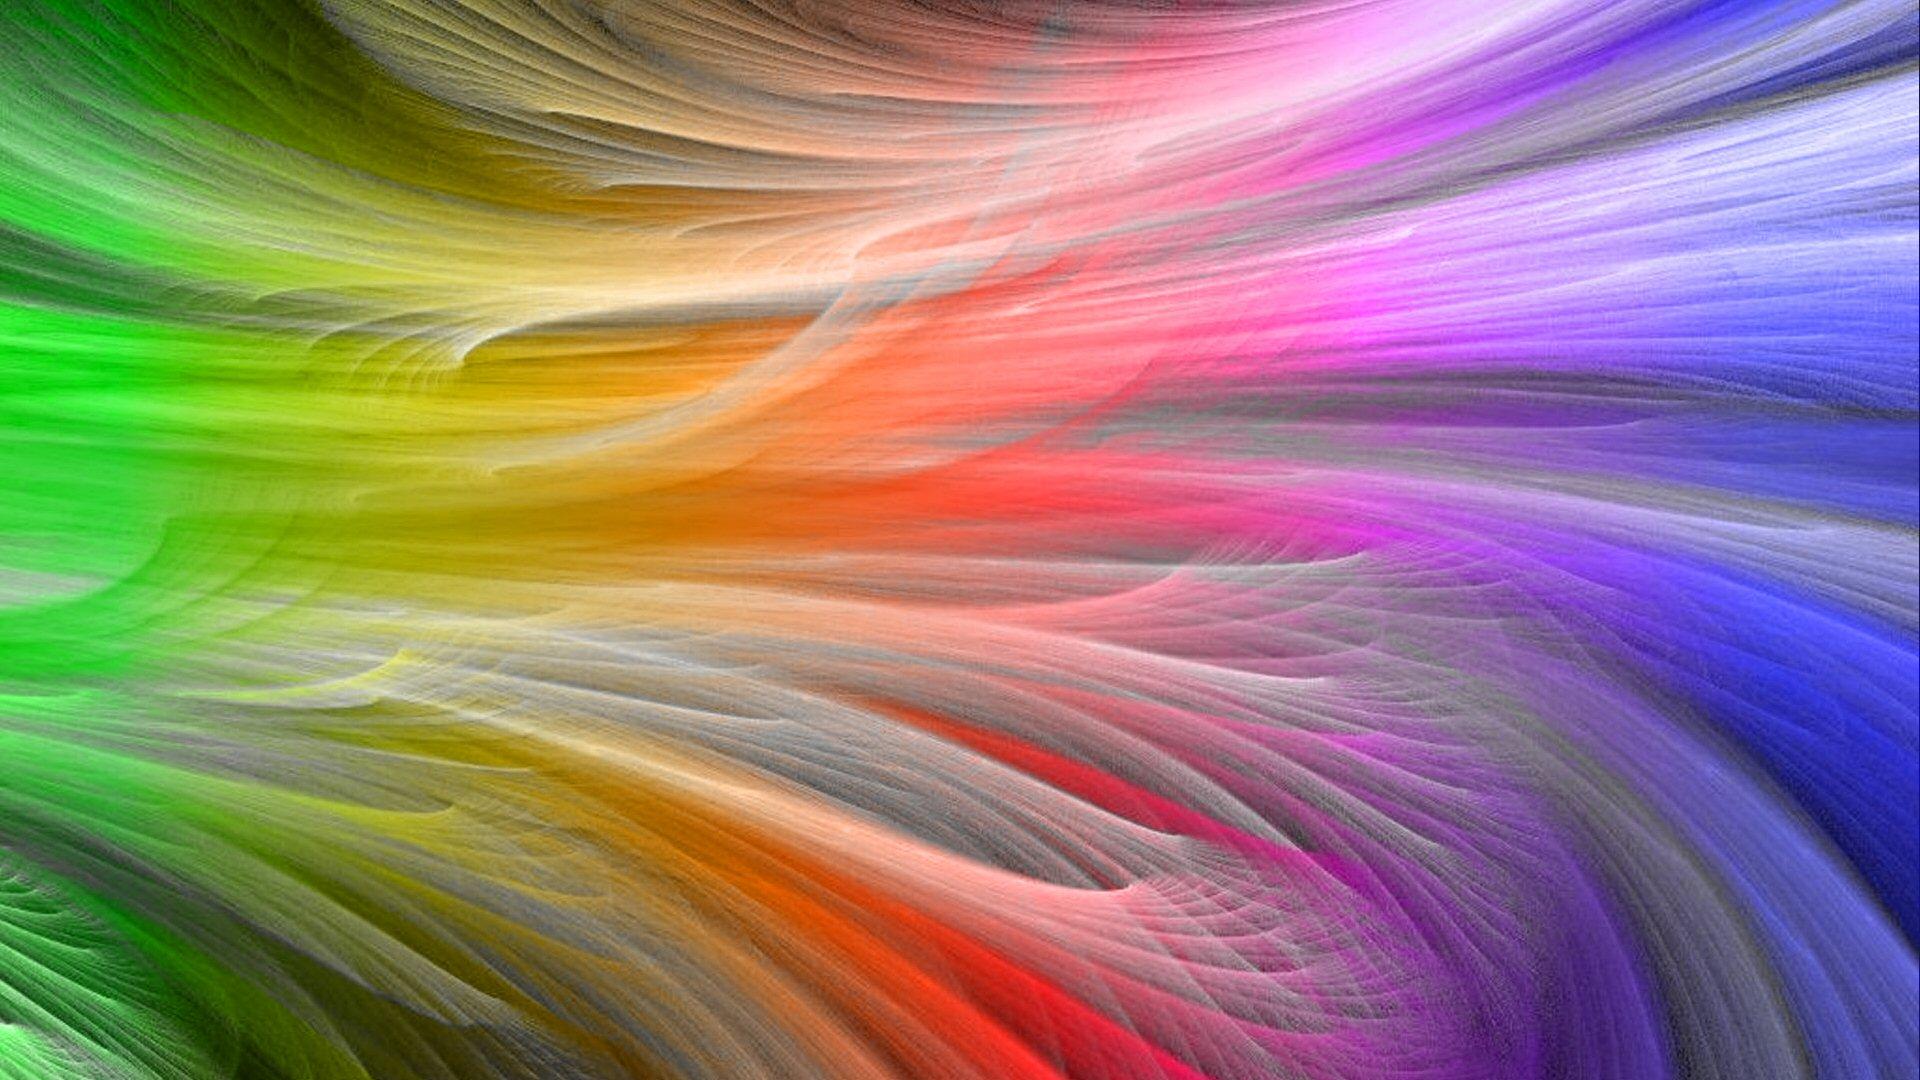 Rainbow Wallpapers, Digital Rainbow, #83